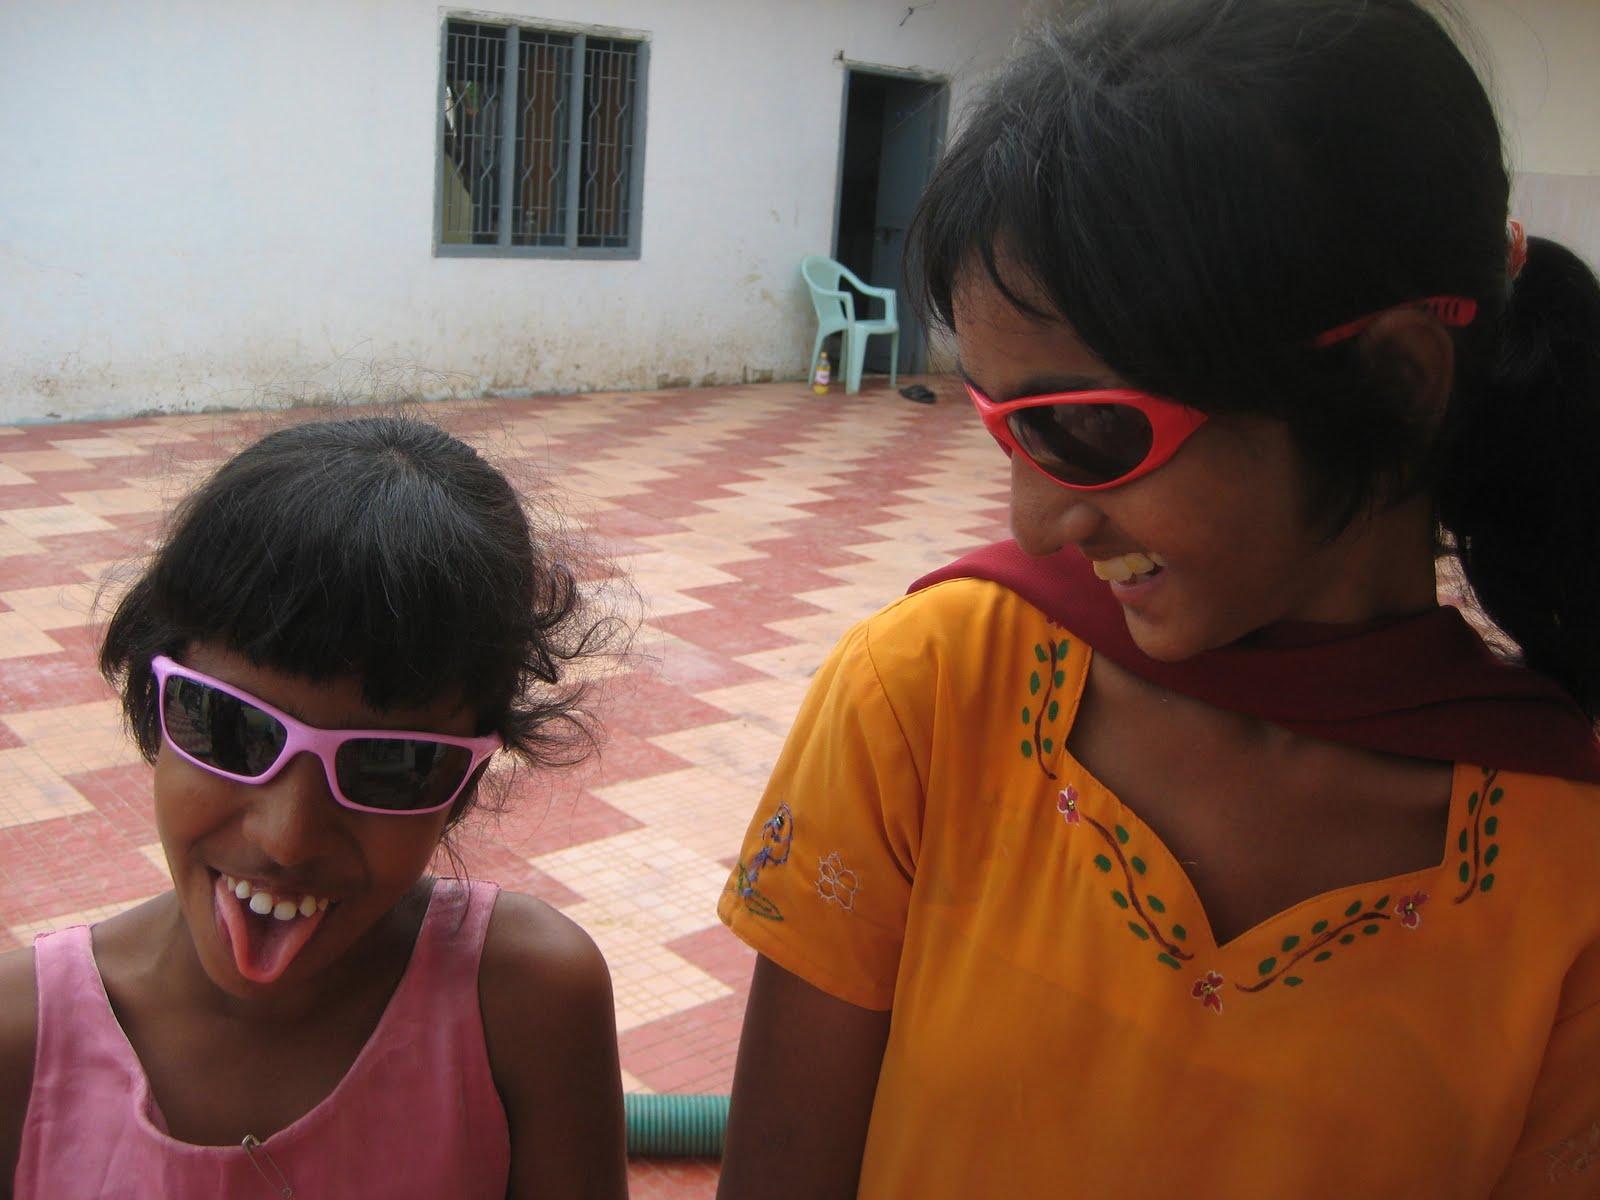 http://3.bp.blogspot.com/_BllI3e-E_x8/S_gZWJrkeCI/AAAAAAAANkU/kxv0vVhDy1k/s1600/may22-sunglasses.jpg